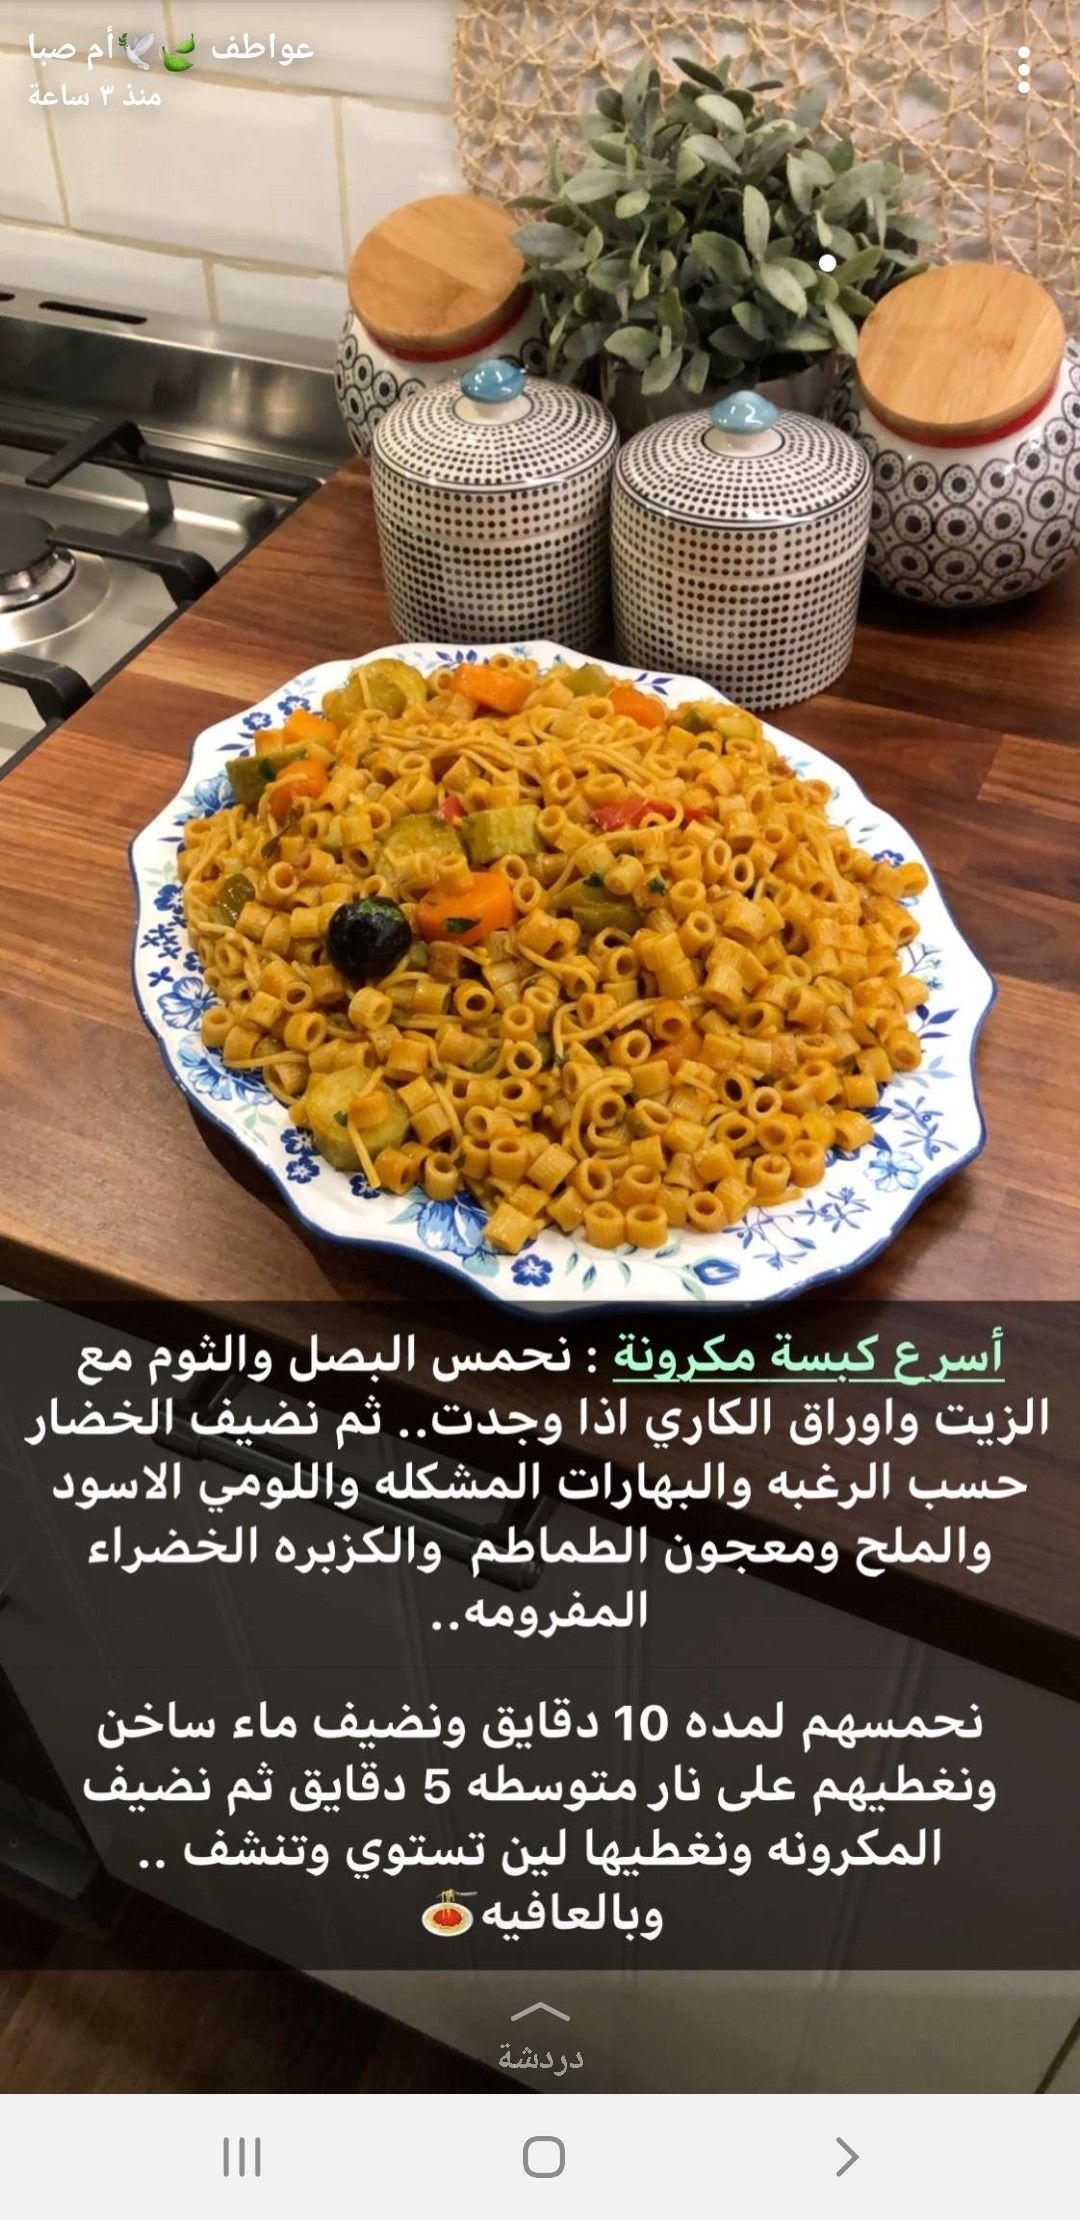 Pin By Rabab El Ramahi On Food Drinks Cookout Food Diy Food Recipes Food